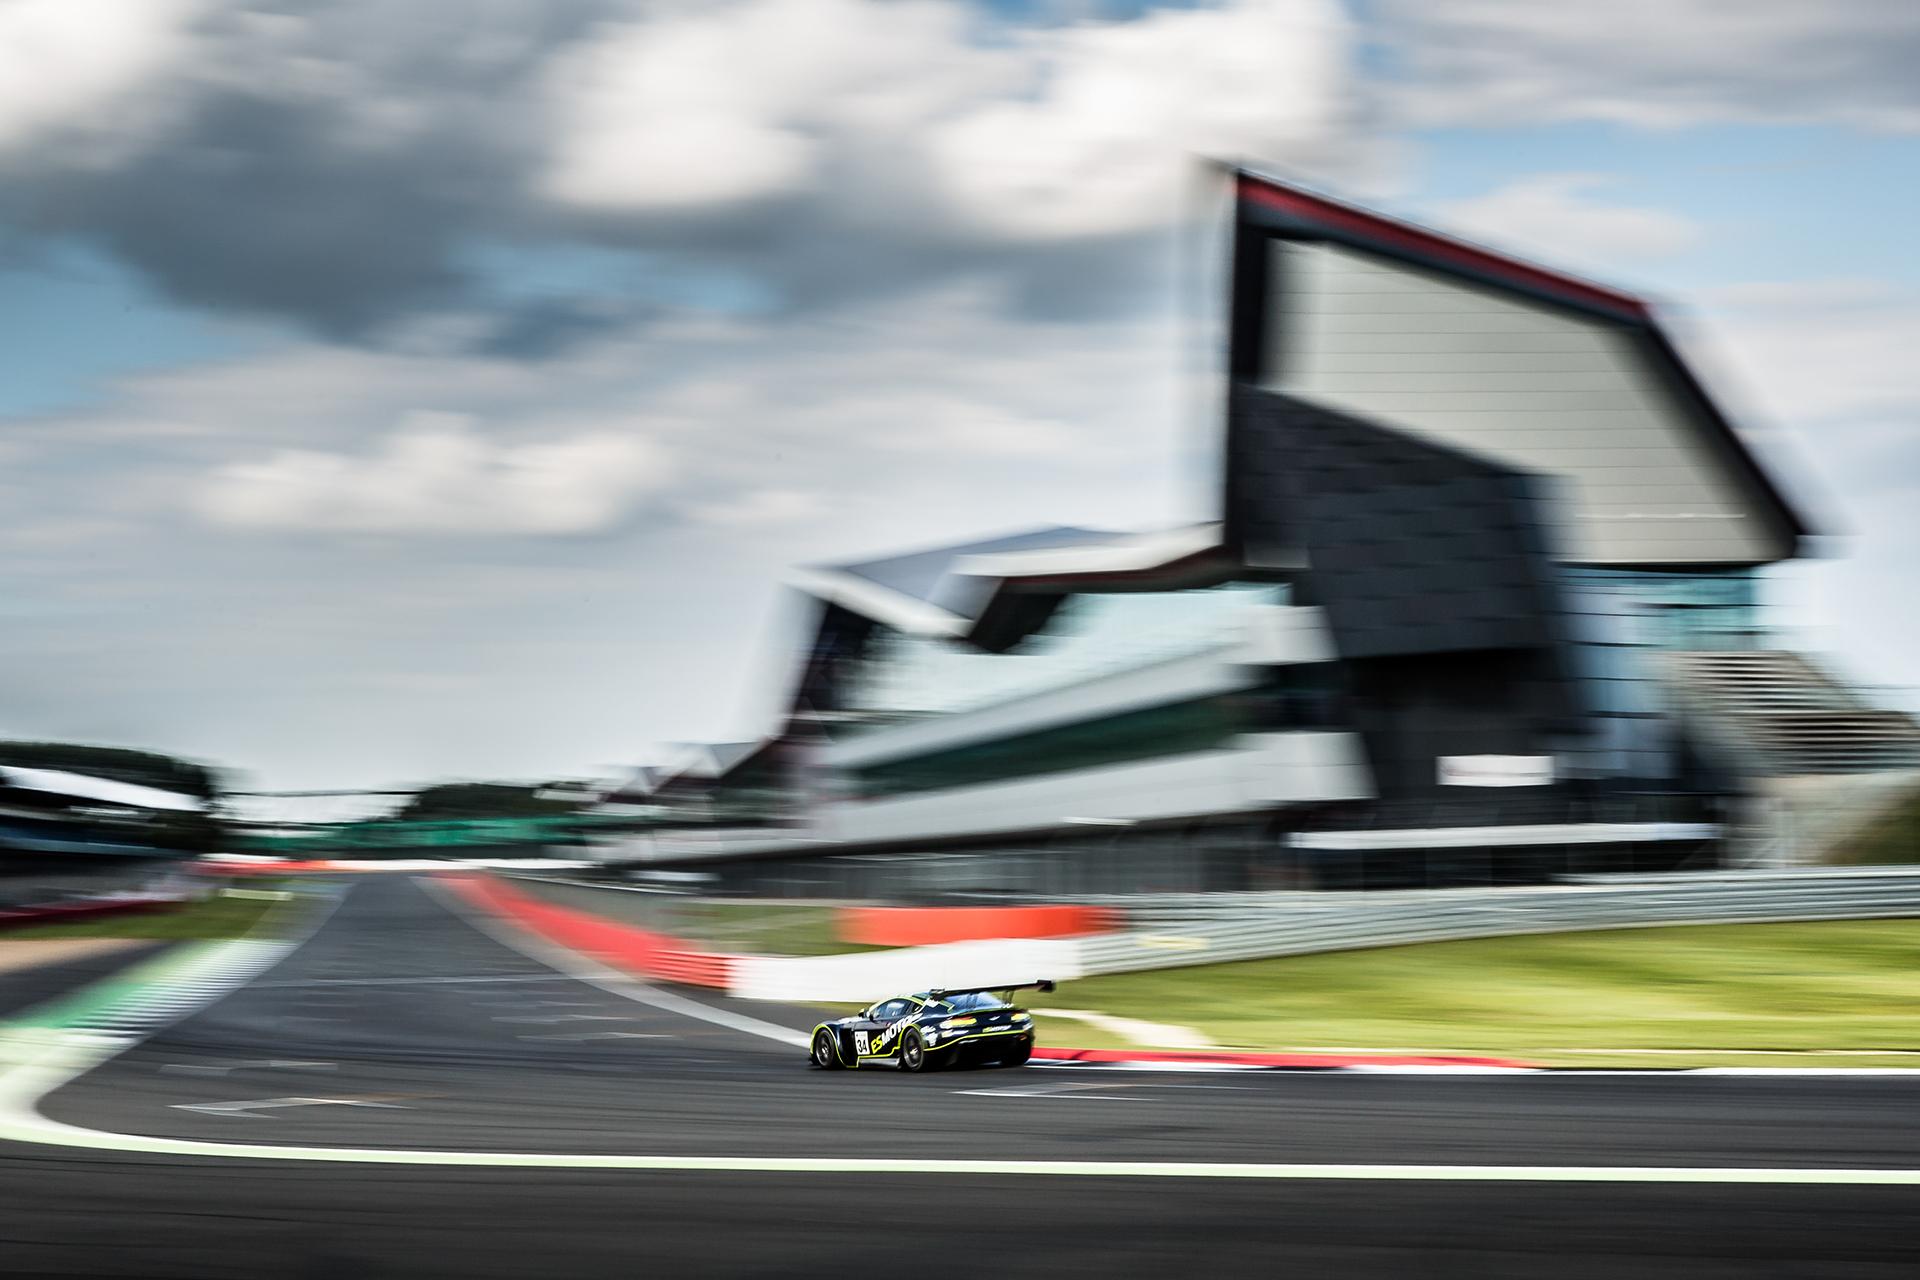 2016-IntGTOpen- Silverstone-50003.jpg